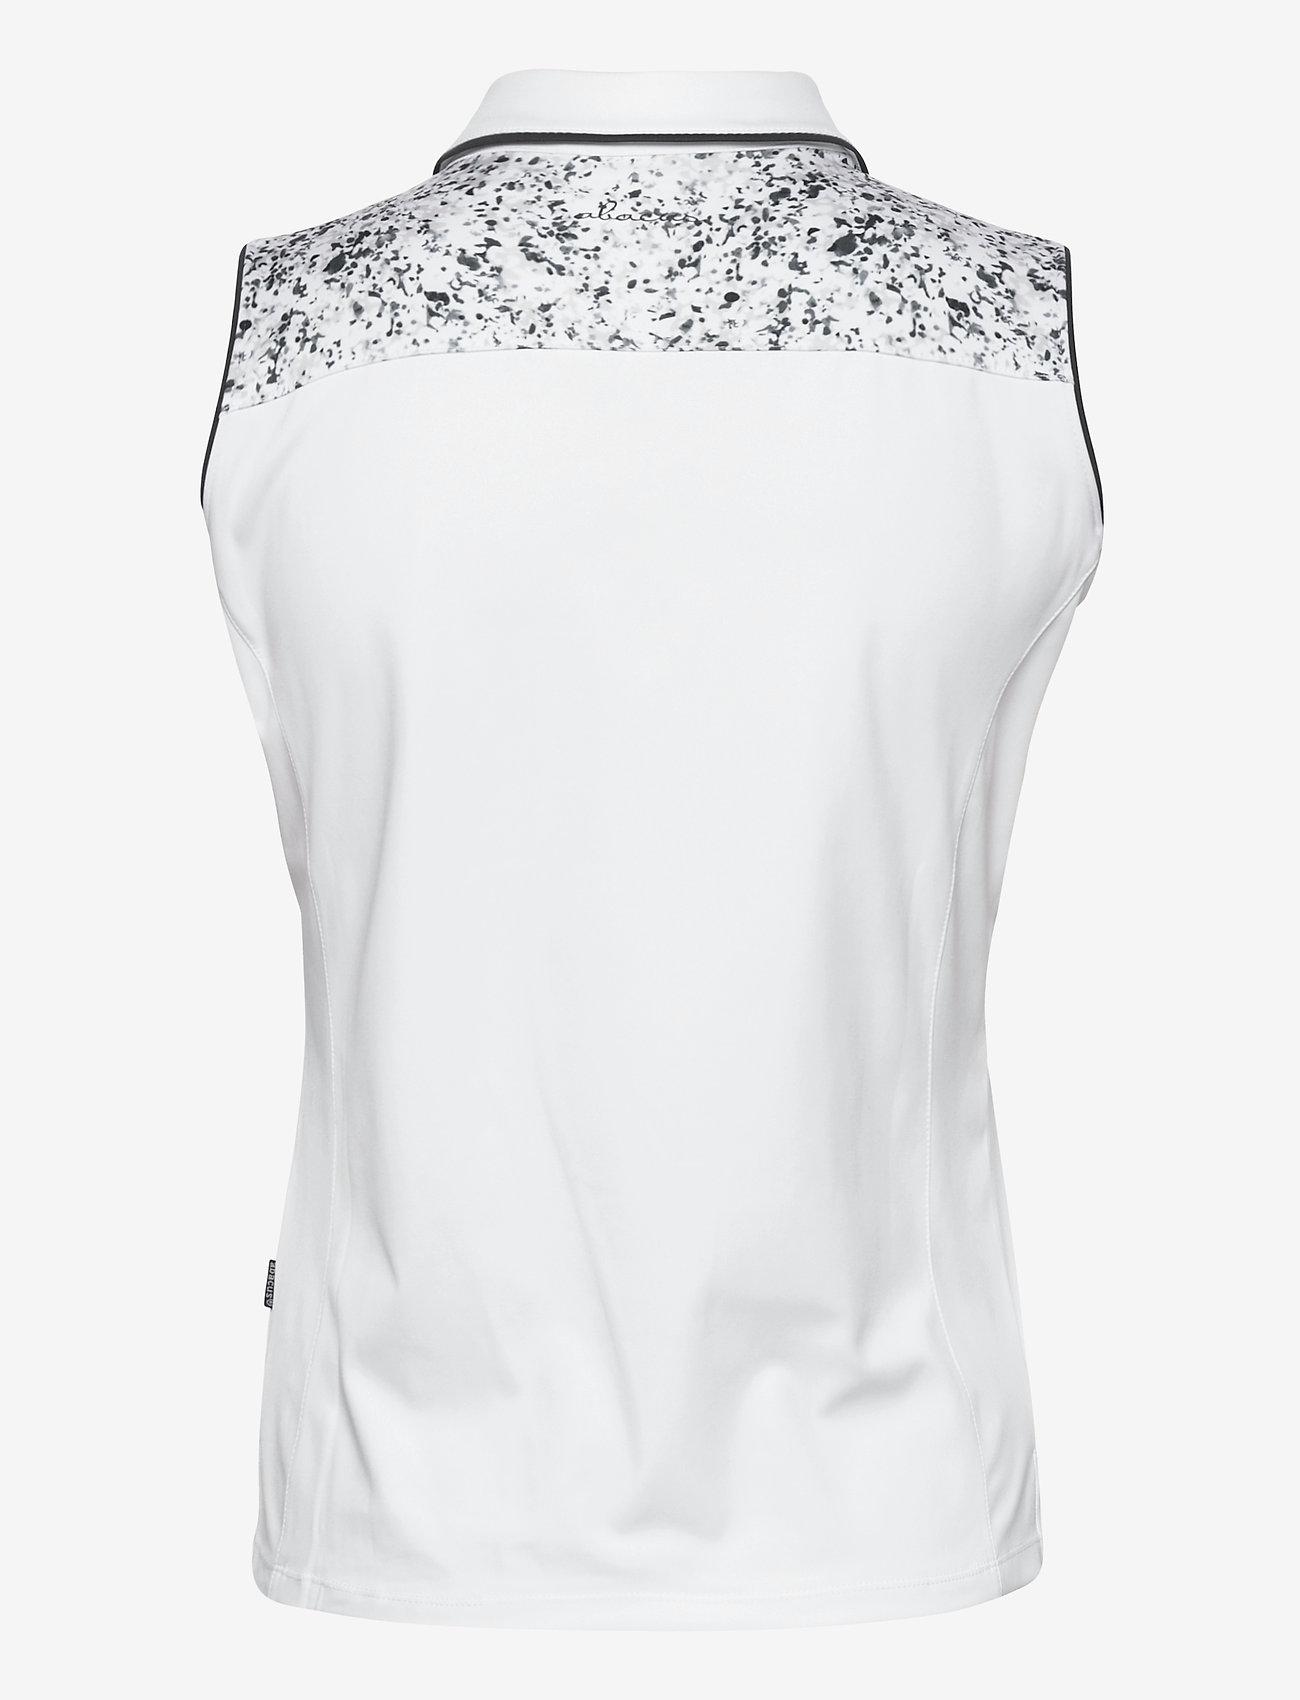 Abacus - Lds Emy sleeveless - topjes - white - 1